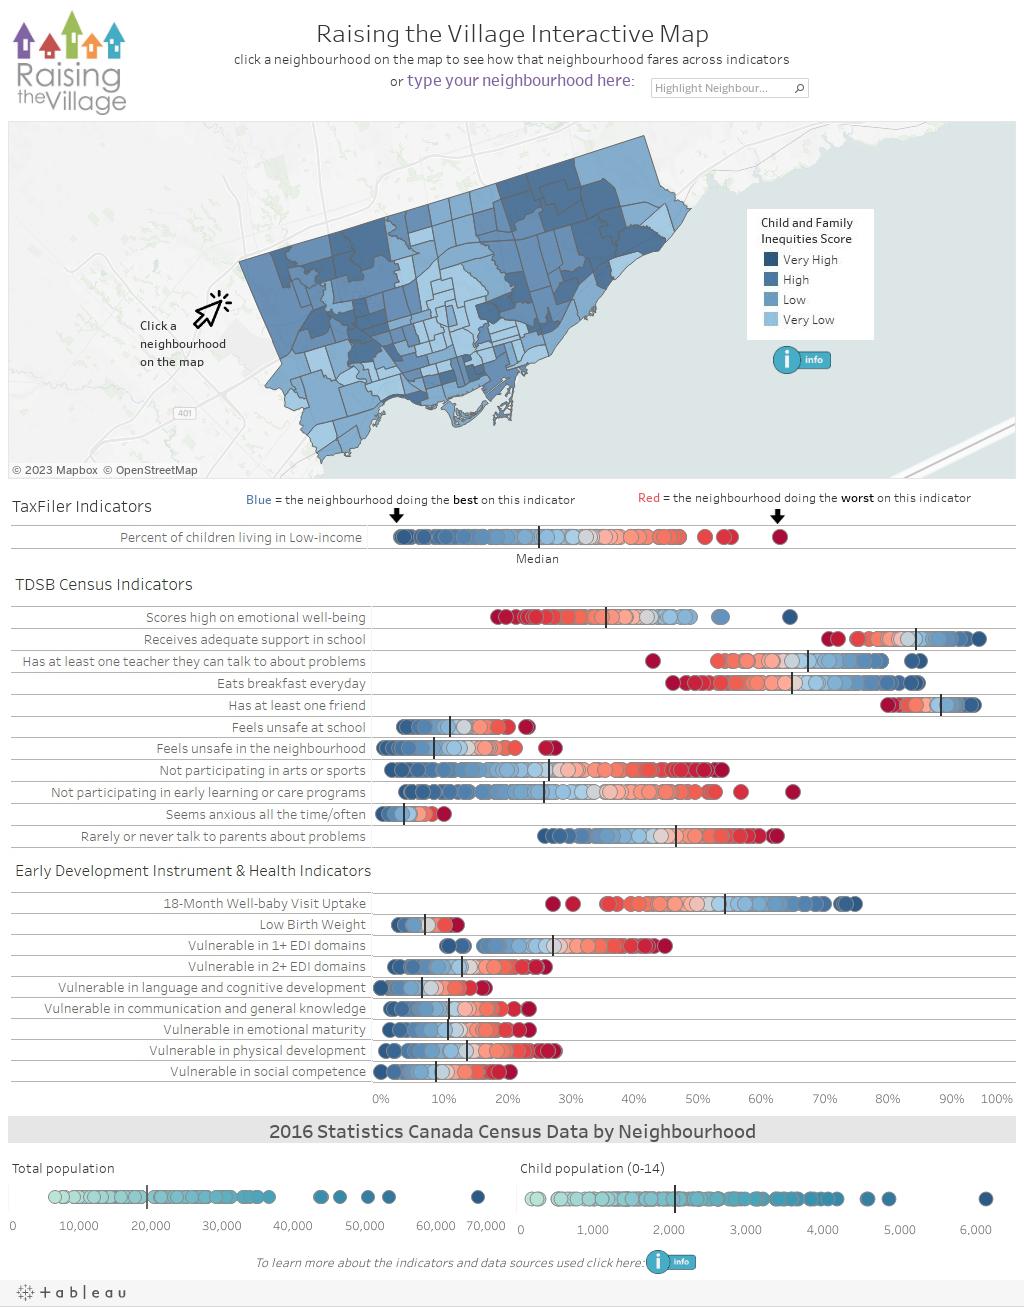 Raising the Village Interactive Mapclick a neighbourhood on the map to see how that neighbourhood fares across indicatorsor type your neighbourhood here: